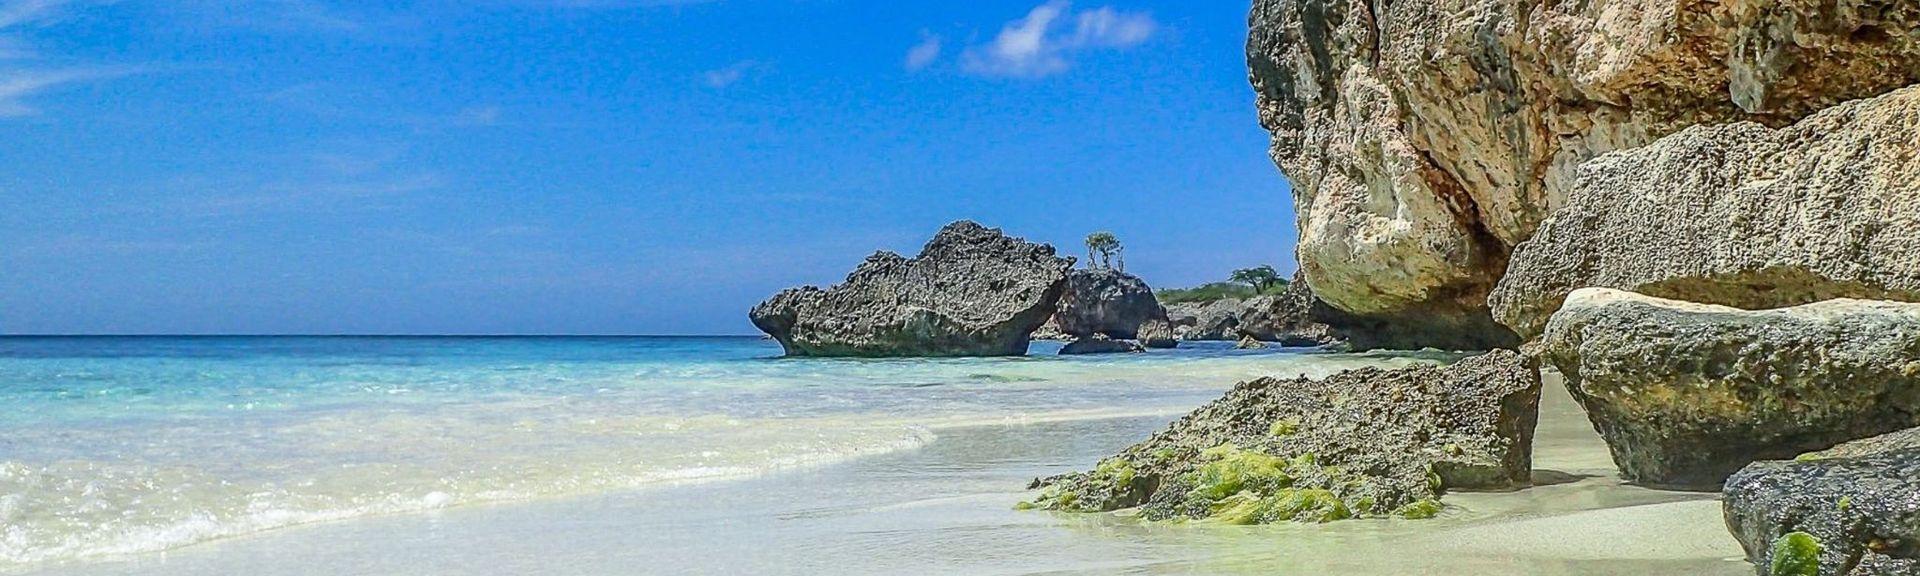 Playa, Kralendijk, Bonaire, Sint Eustatius and Saba